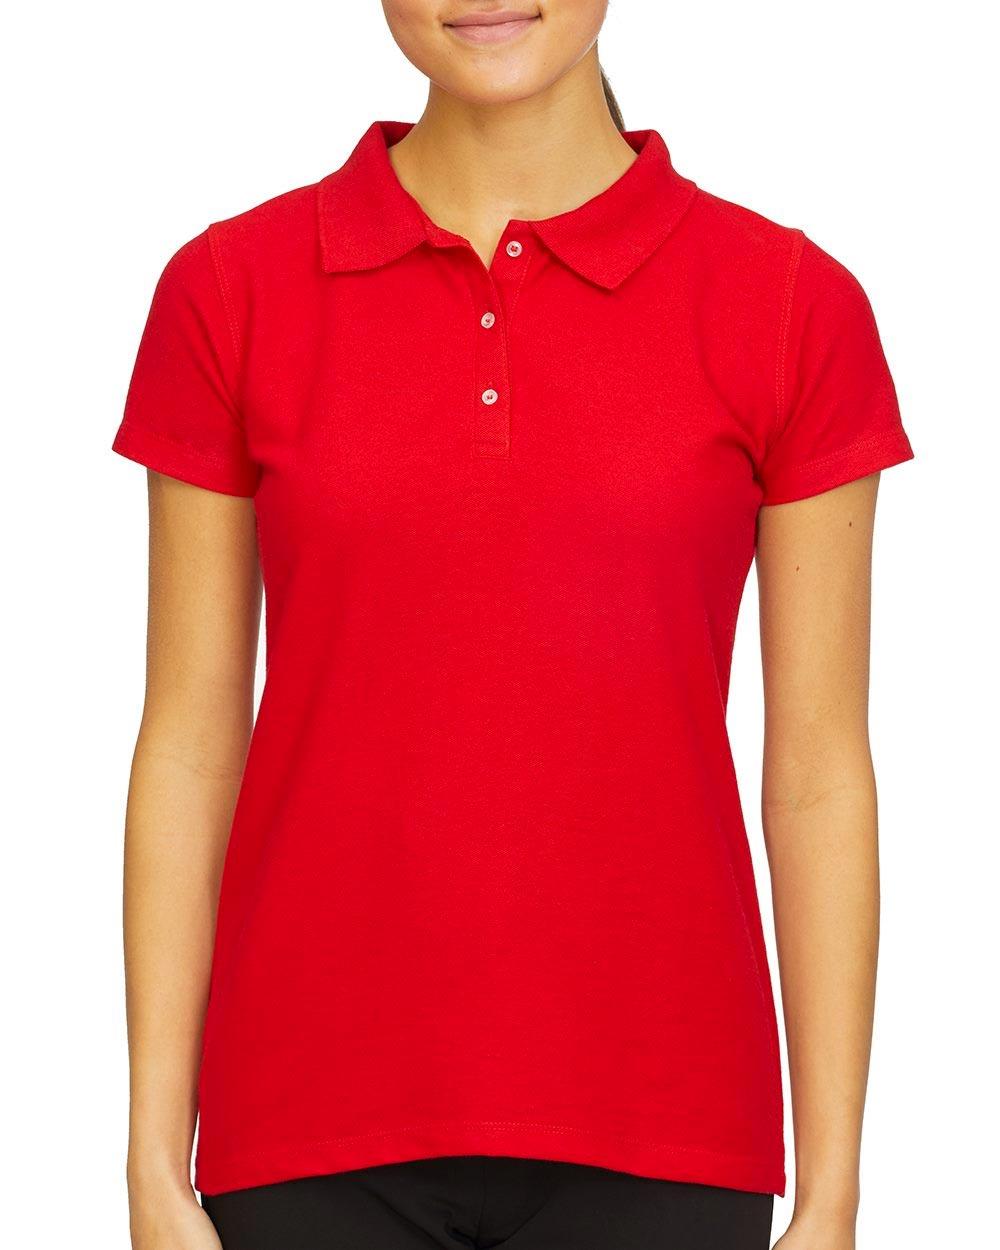 M&O Knits 7007 - Women's Soft Touch Sport Shirt